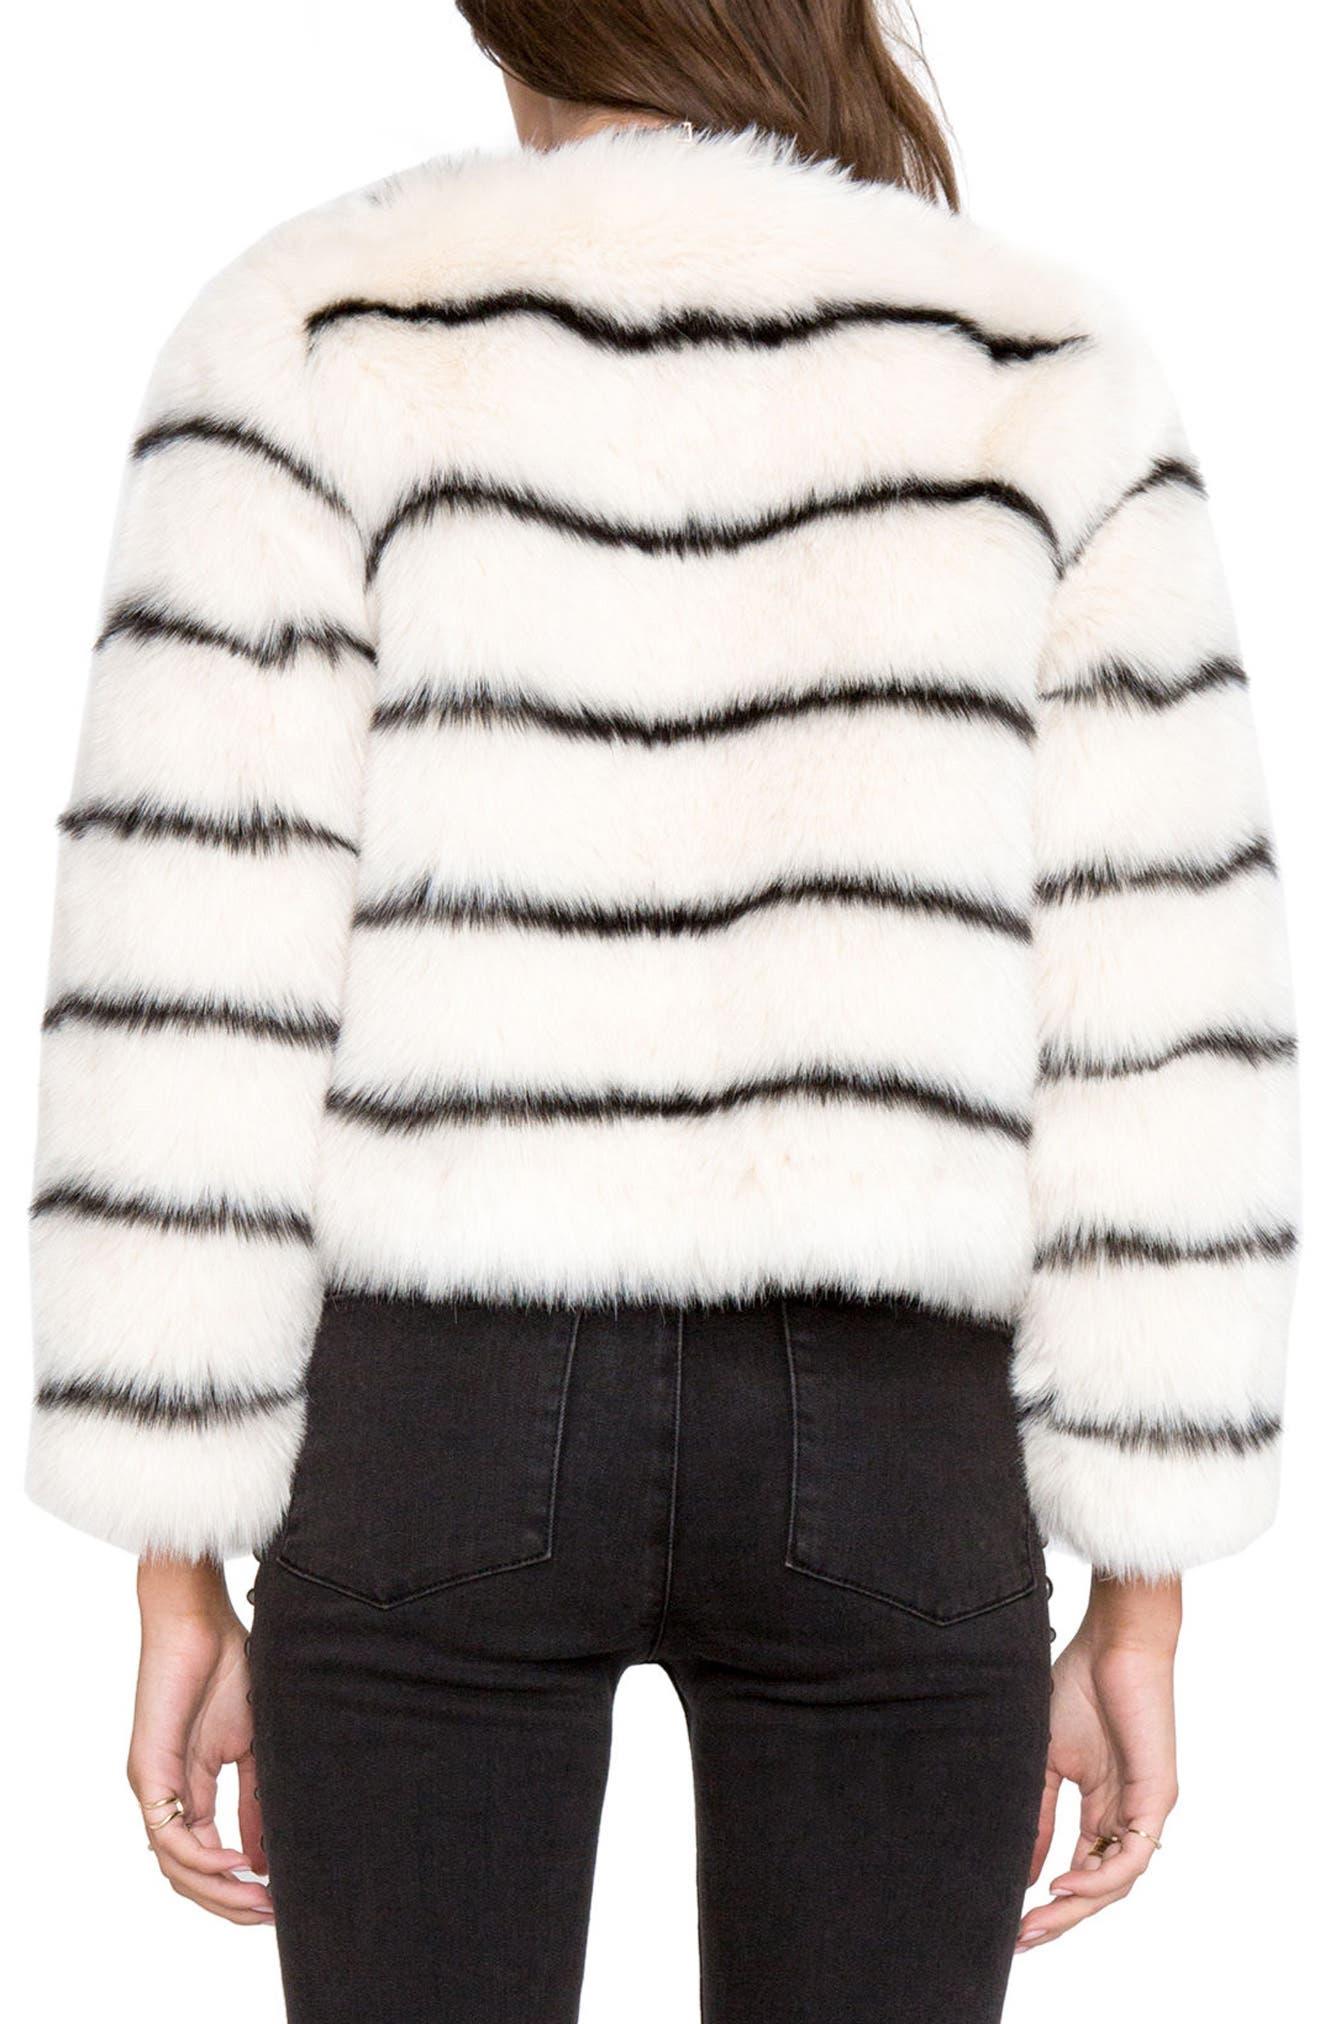 Tahlia Faux Fur Jacket,                             Alternate thumbnail 3, color,